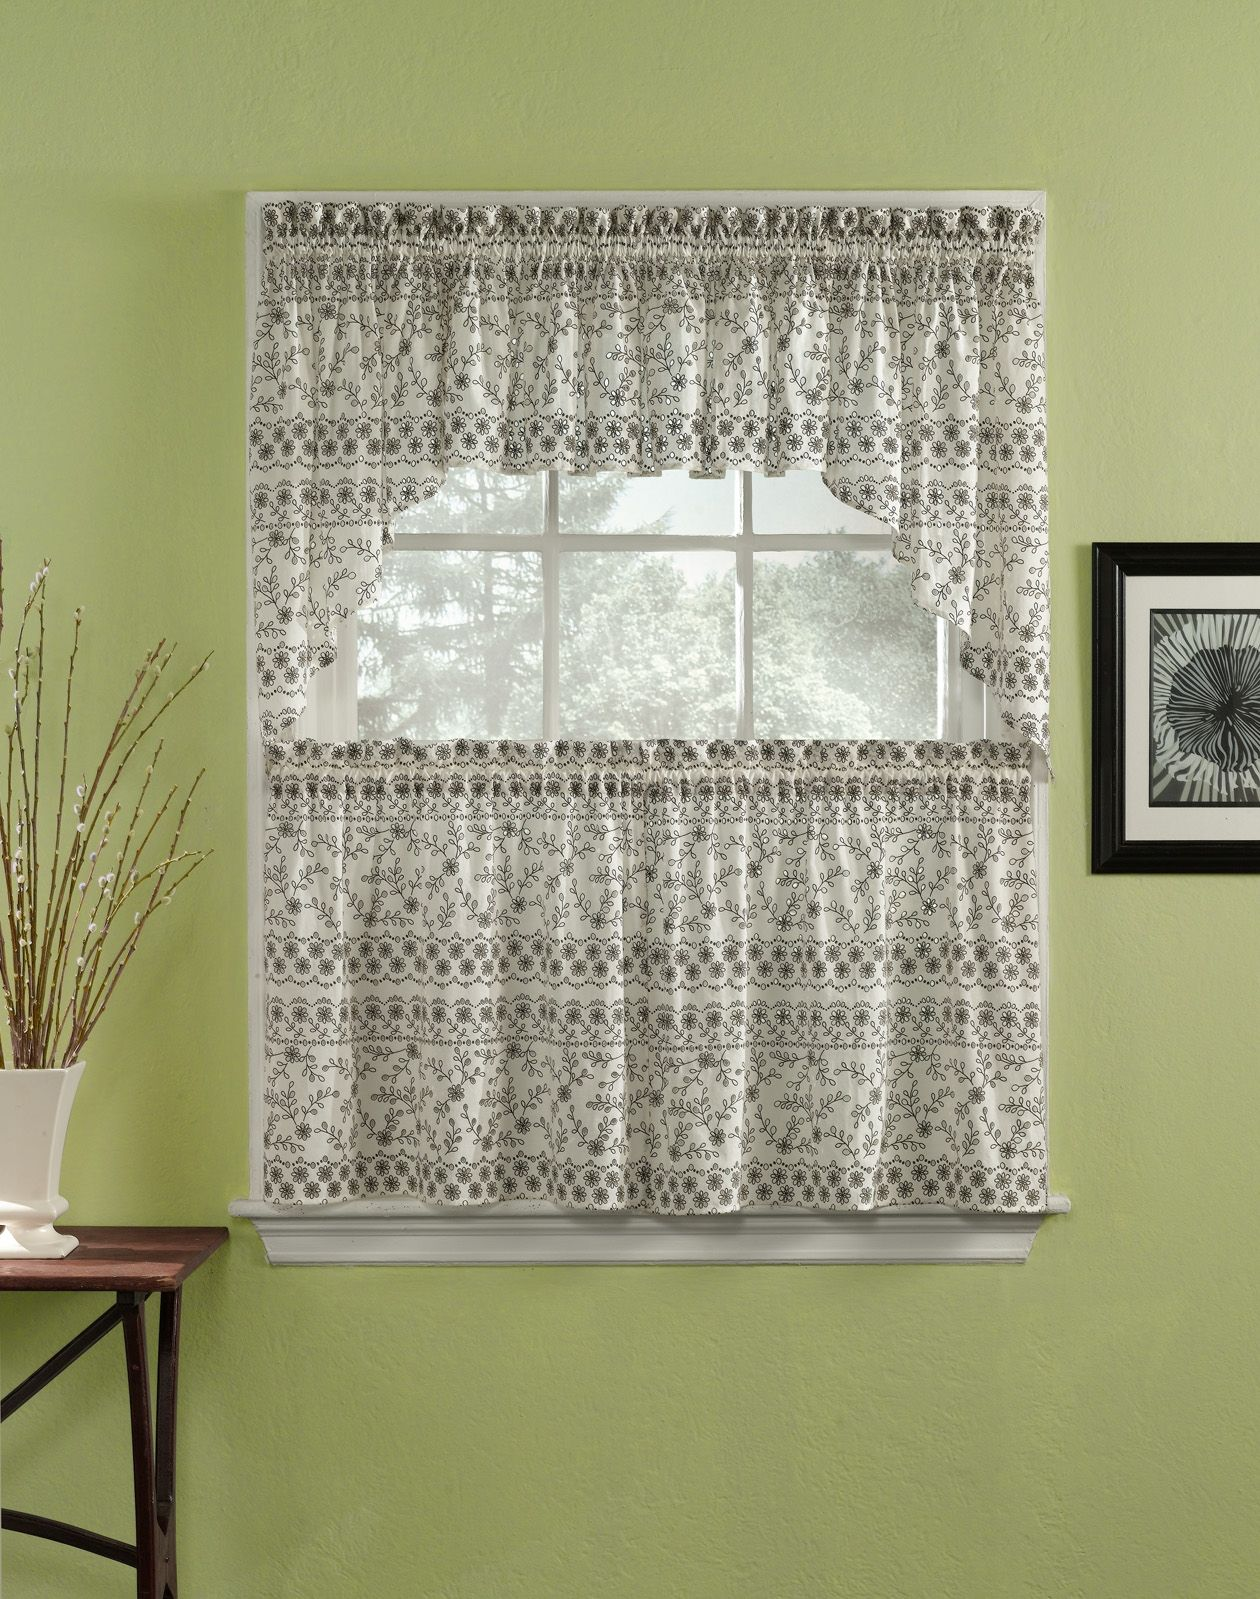 Eyelet lace kitchen curtains latulufofeed pinterest